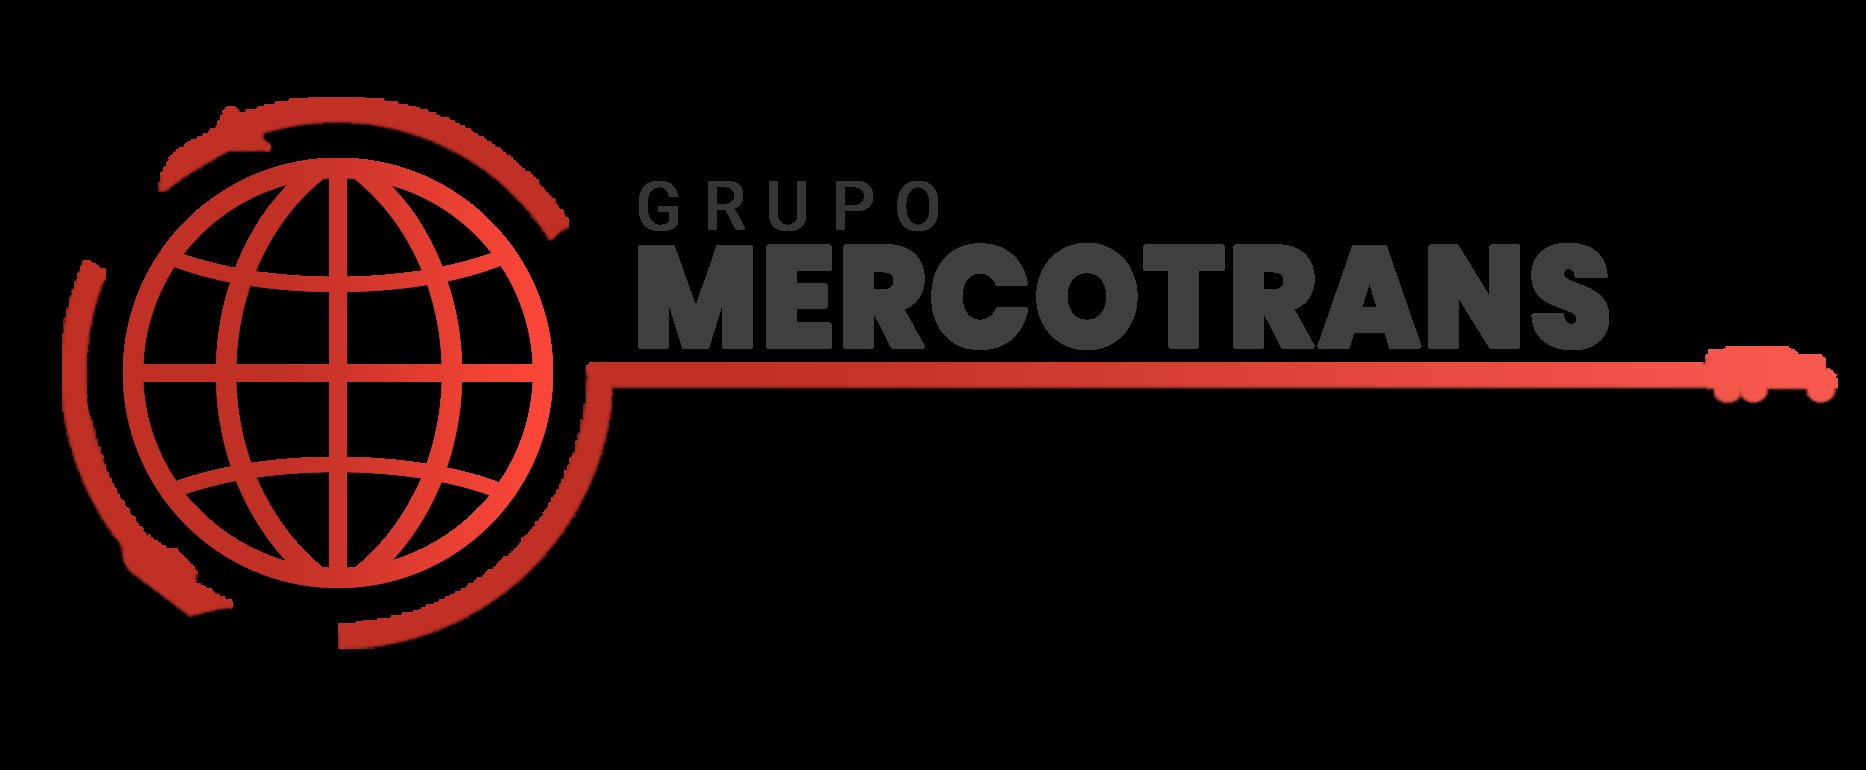 Mercotrans